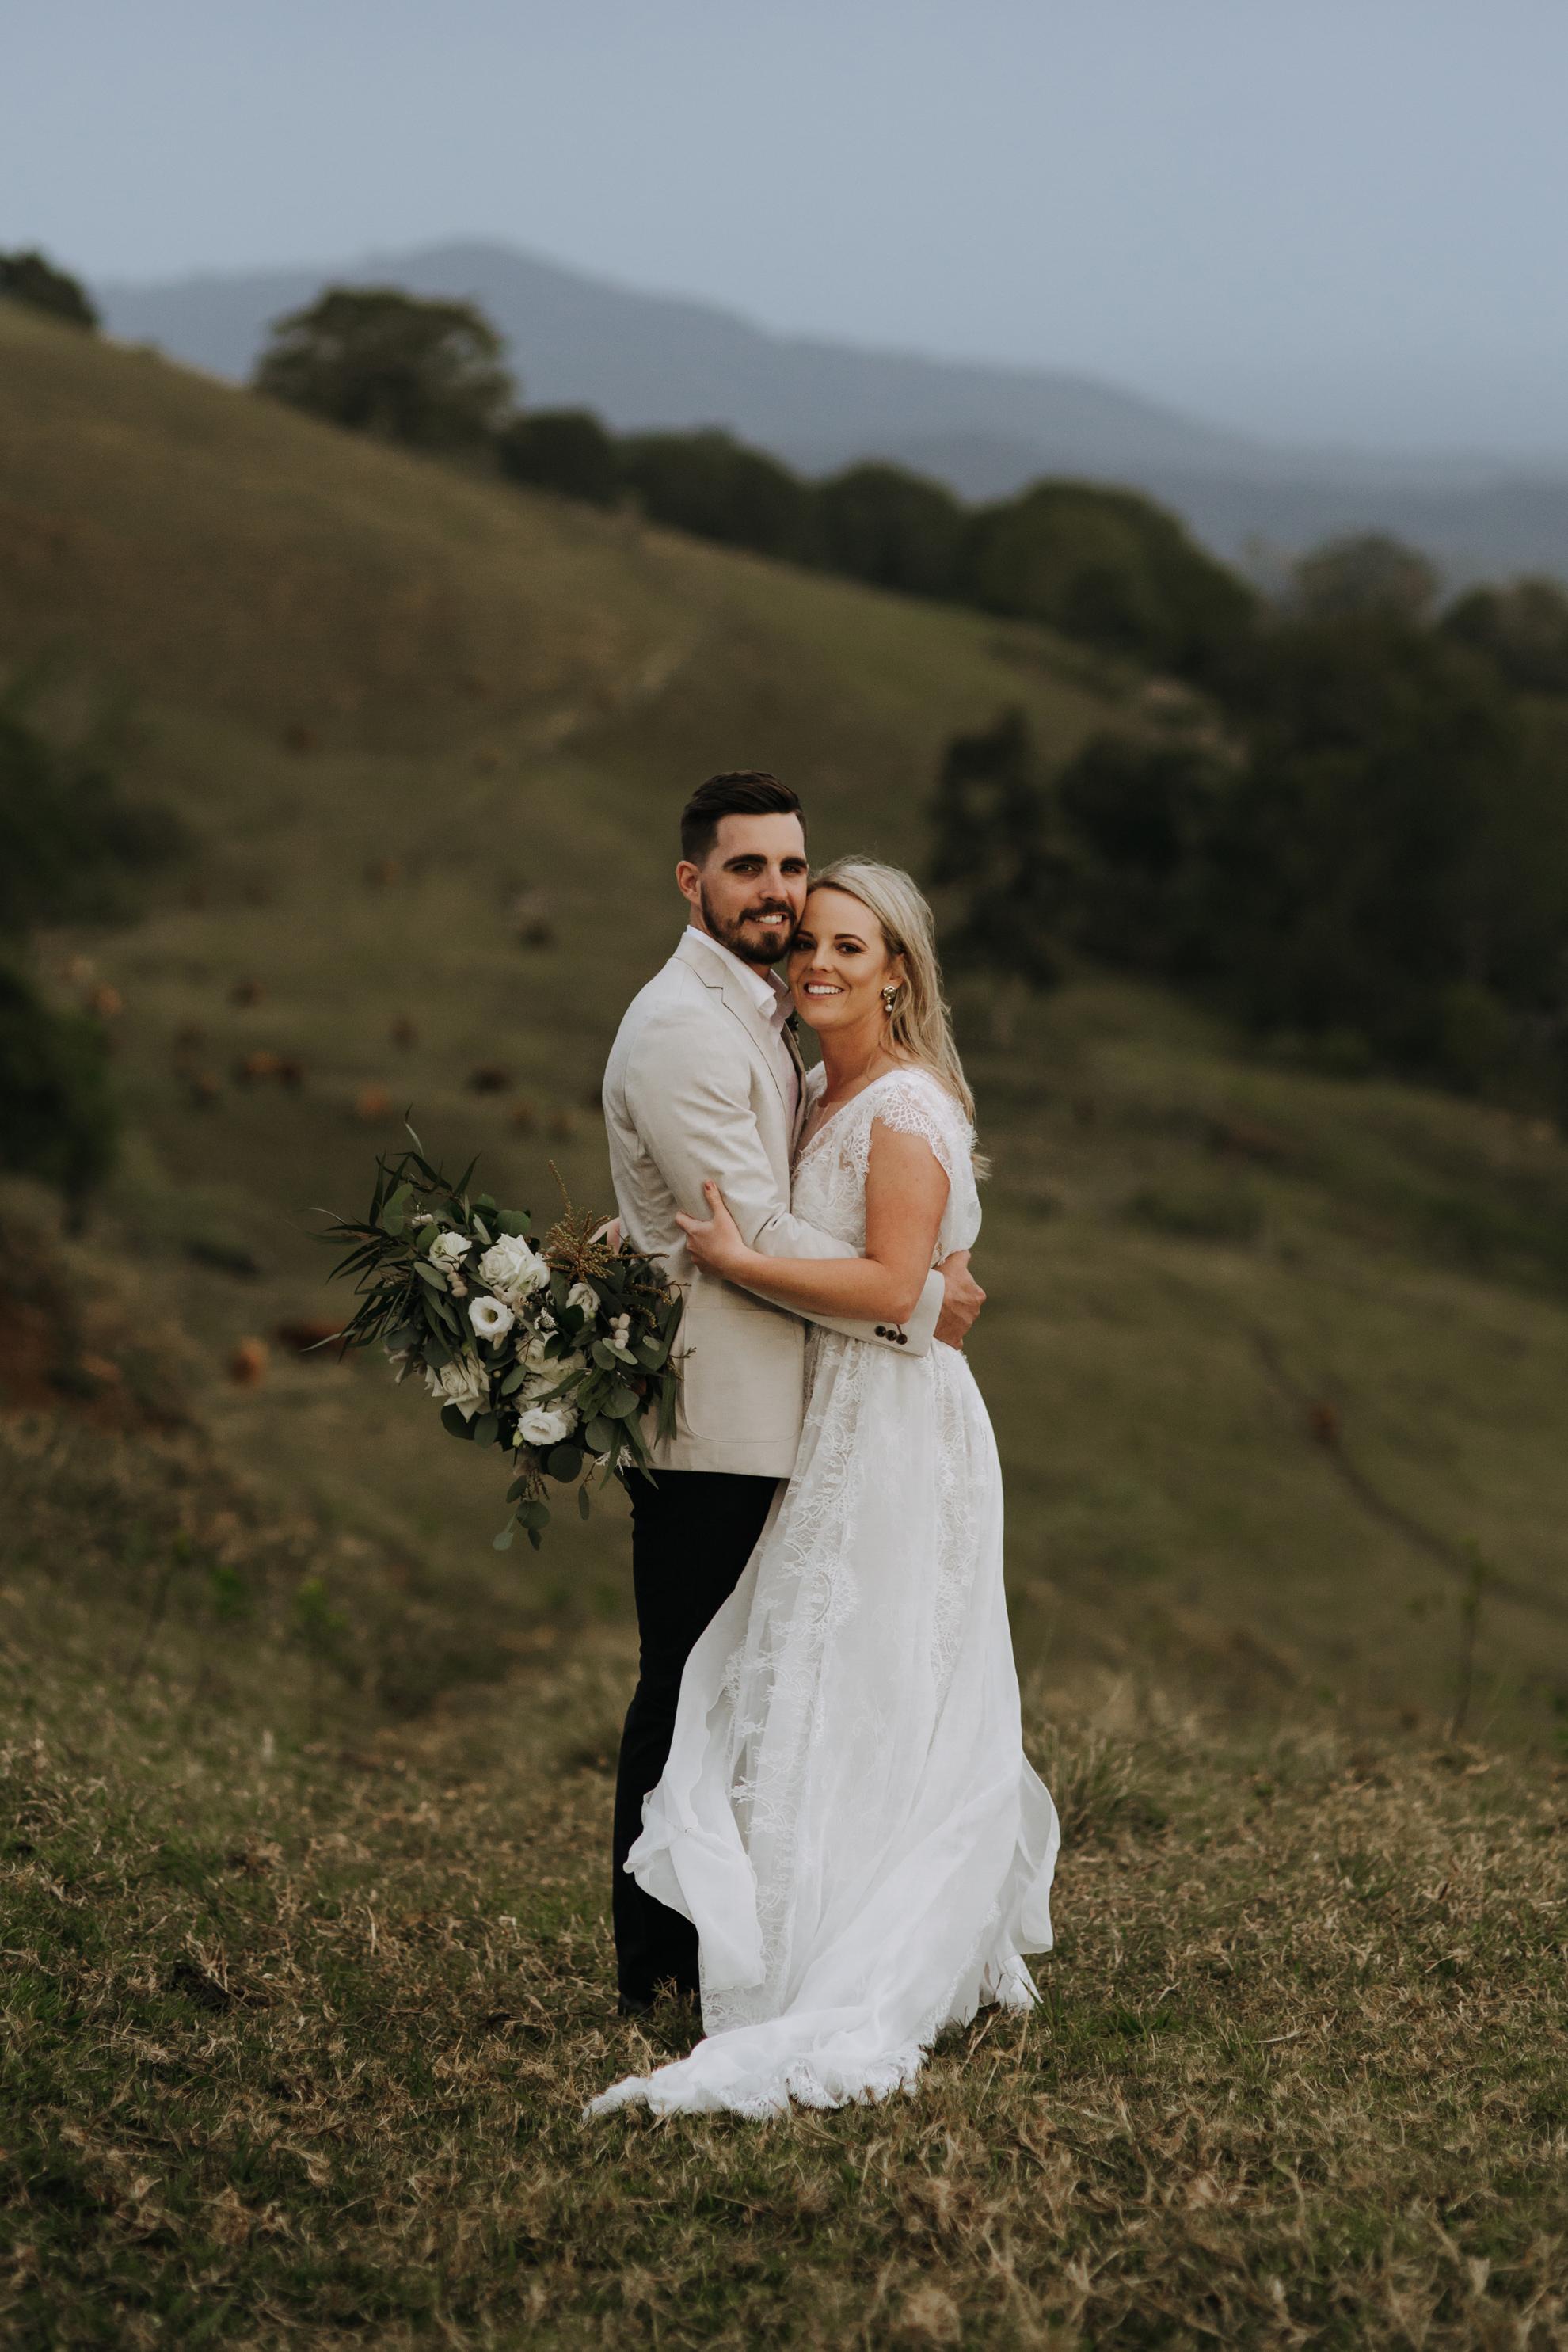 066-Kirby_Lewis_Maleny_Manor_Wedding.jpg